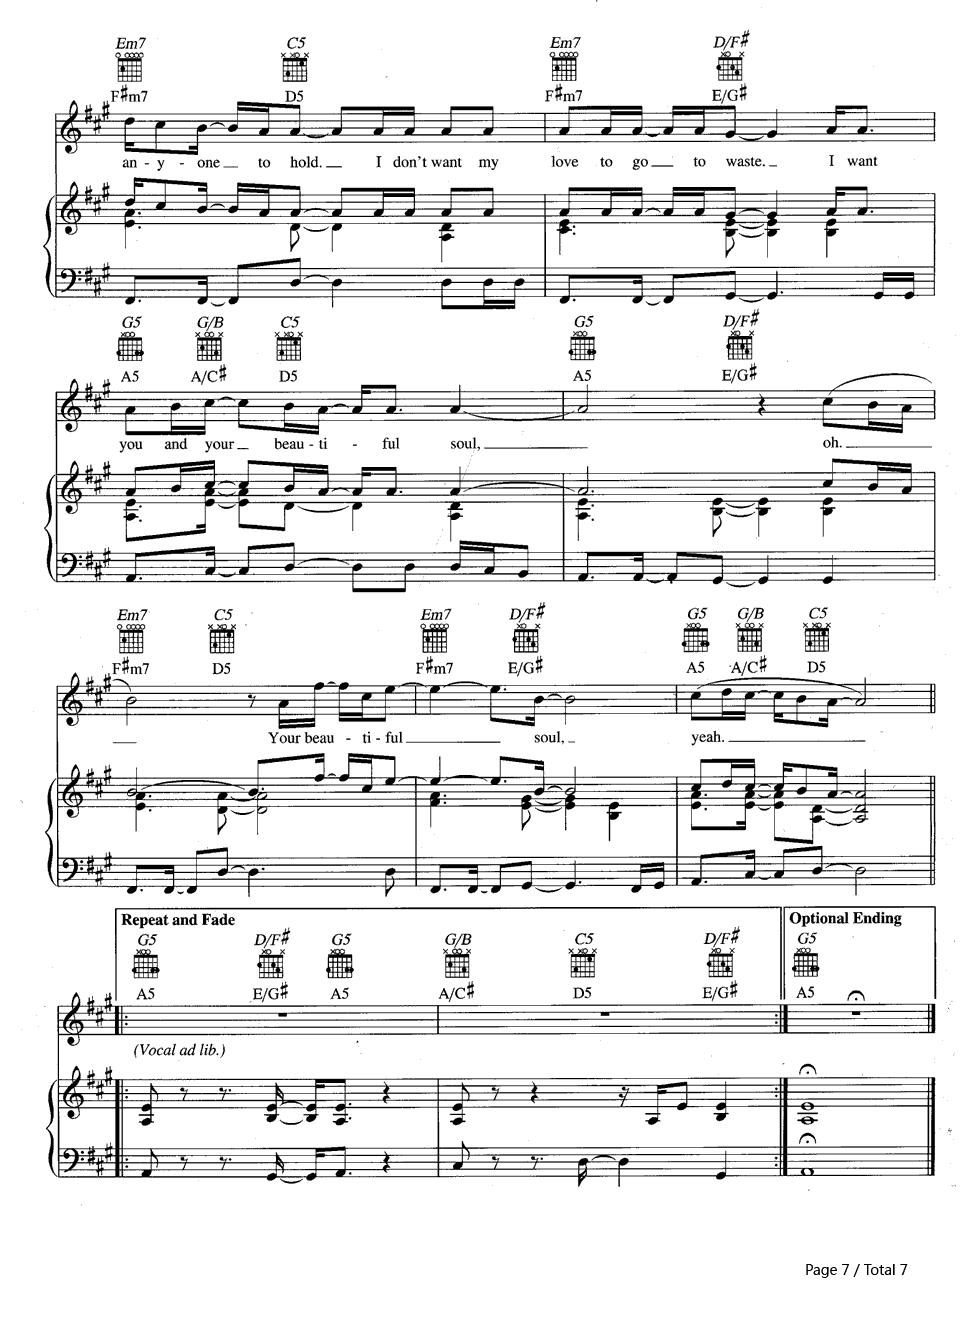 Beautiful Soul-Jesse McCartney Stave Preview 7-Free Piano Sheet Music u0026 Piano Chords